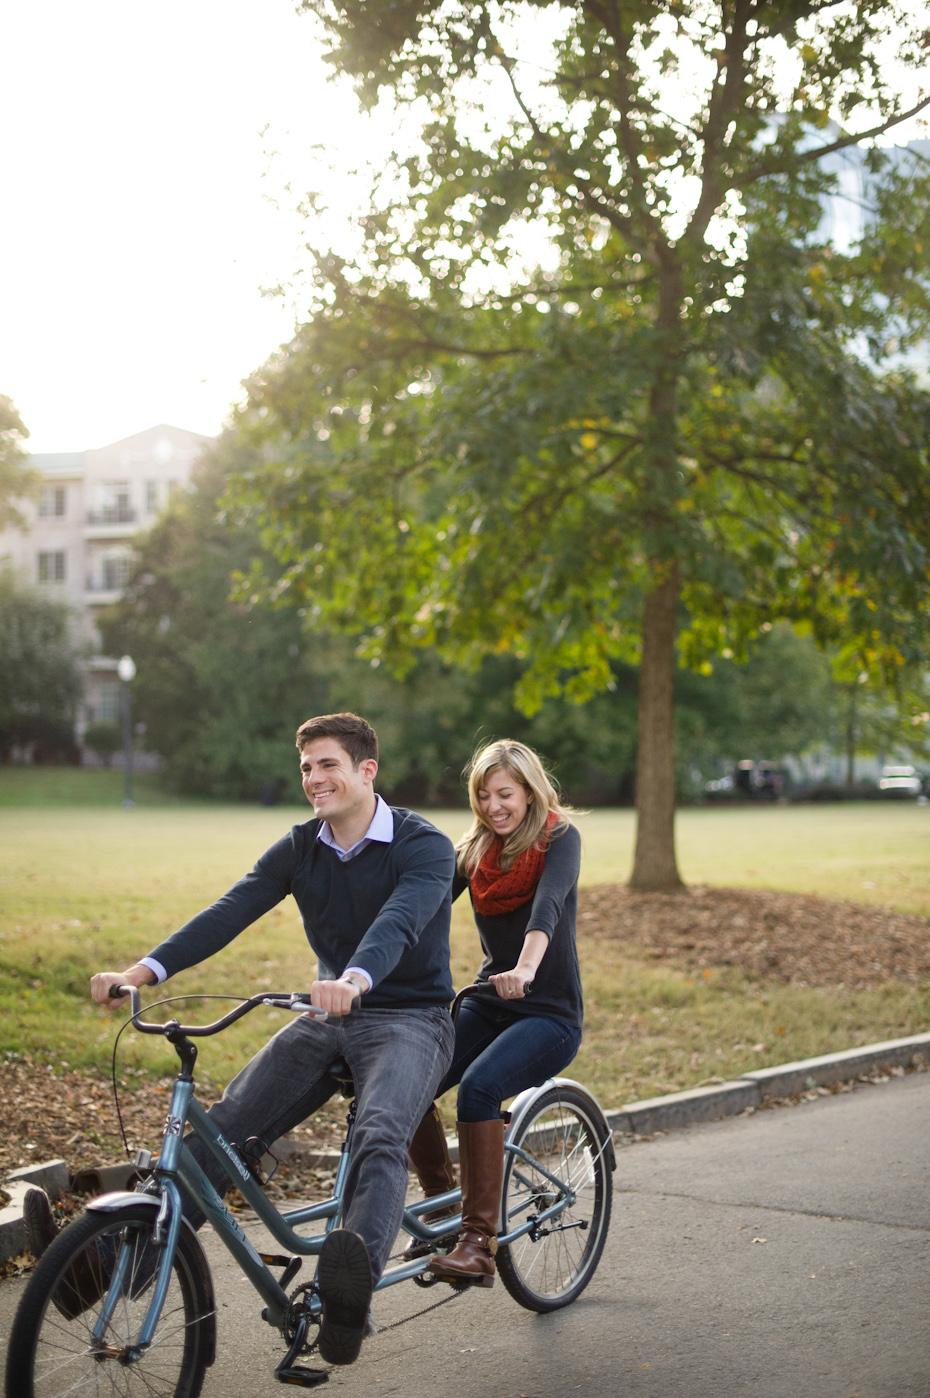 Bike themed engagement shoot